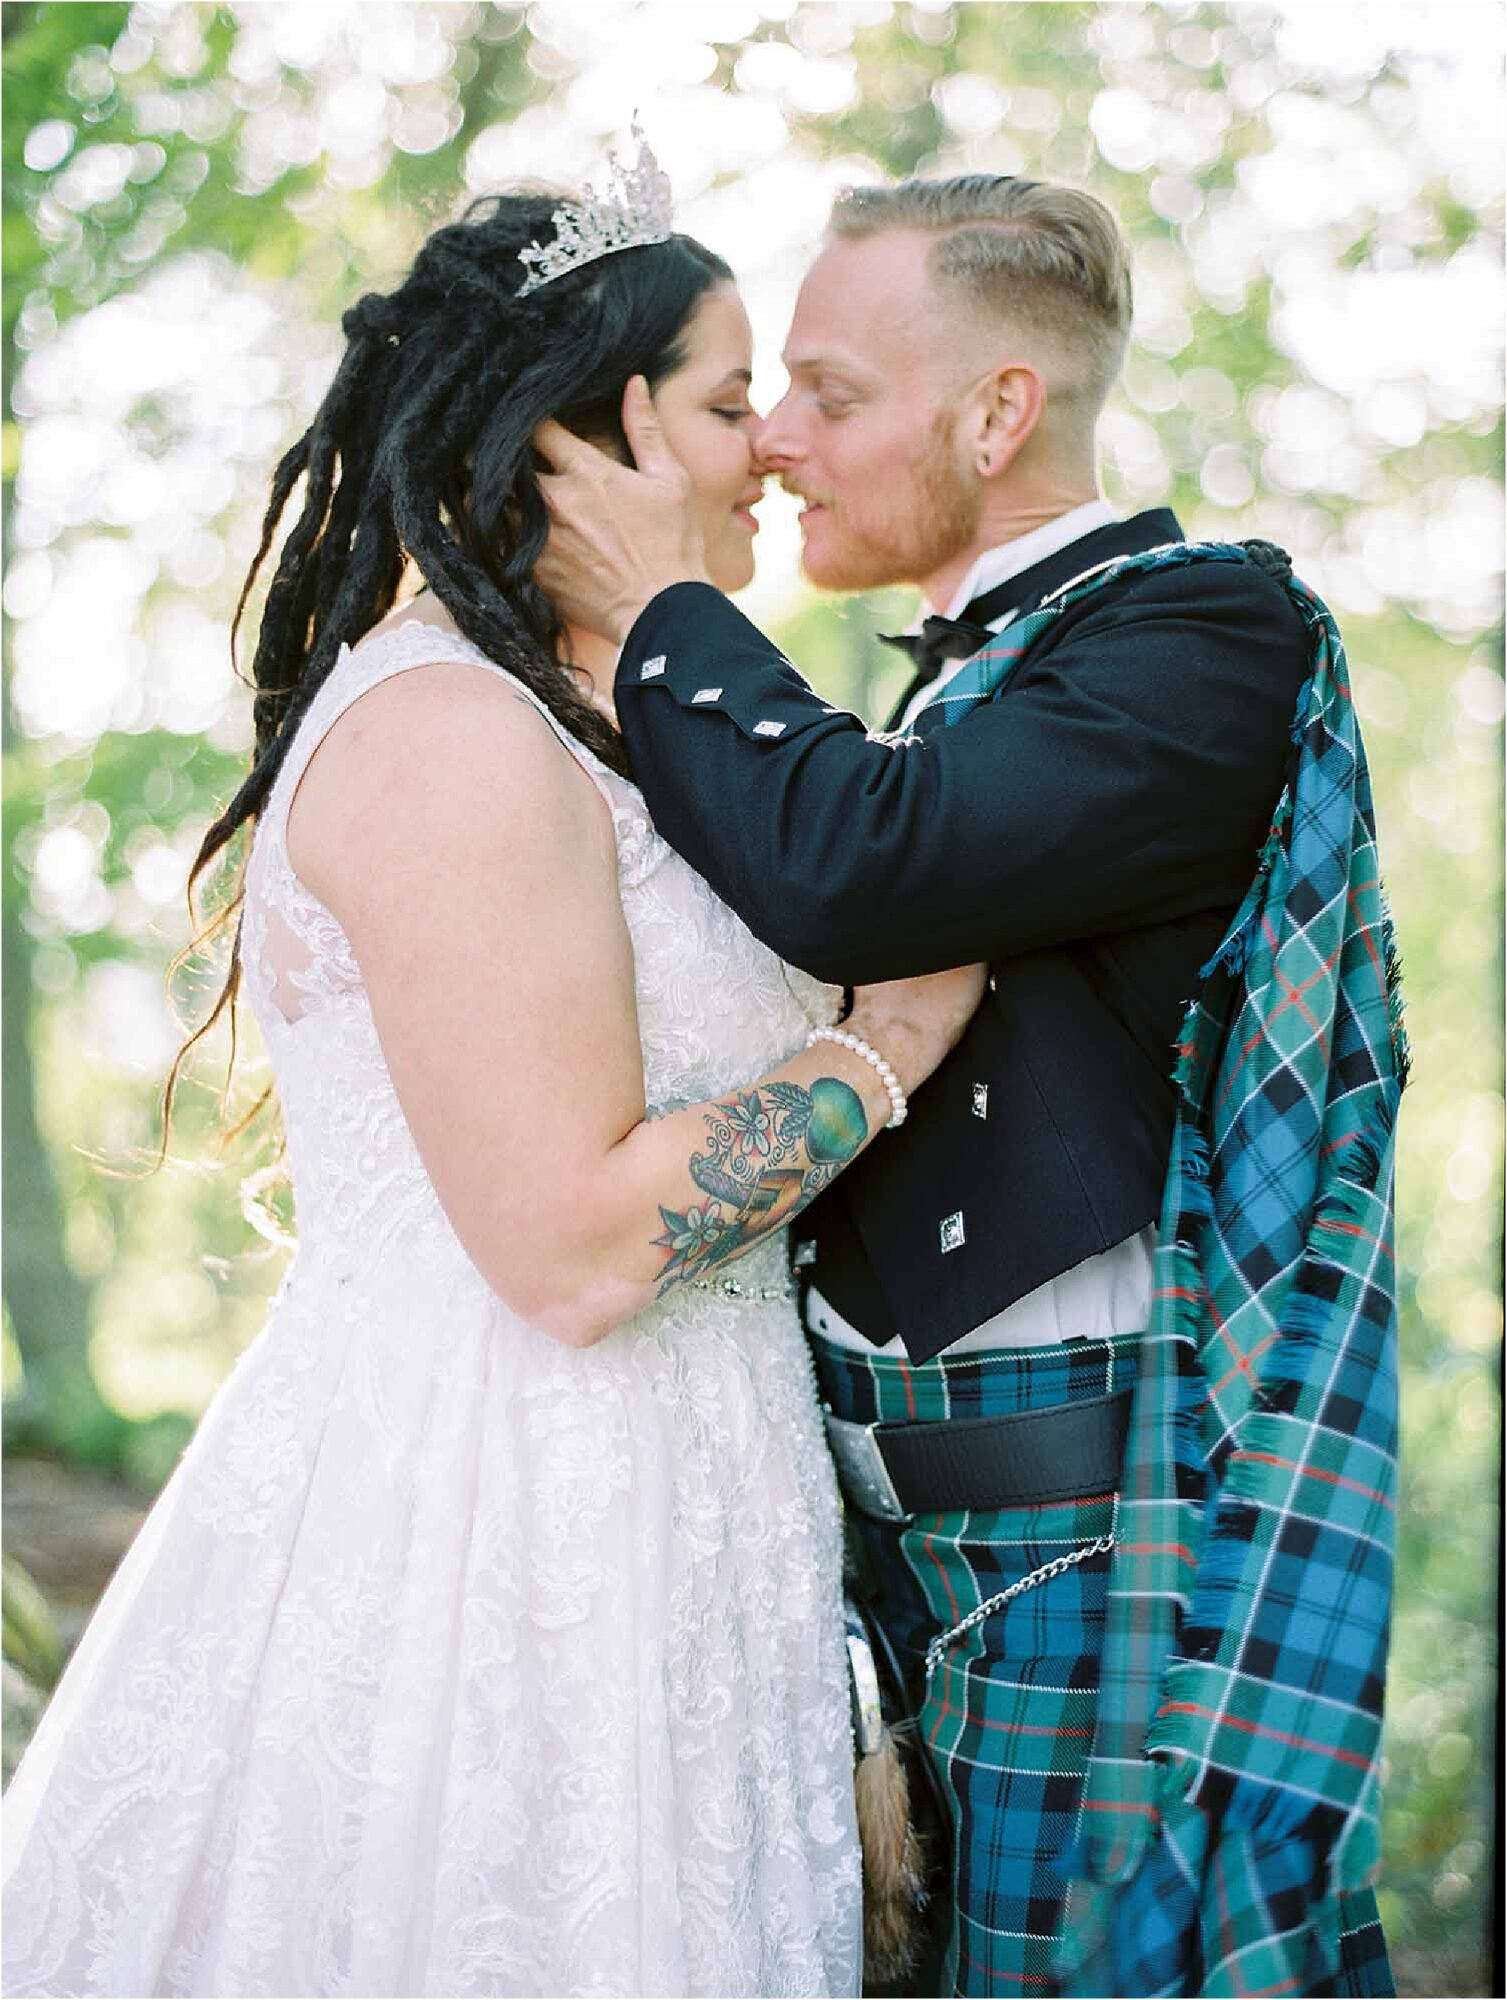 bride and groom in kilt kiss